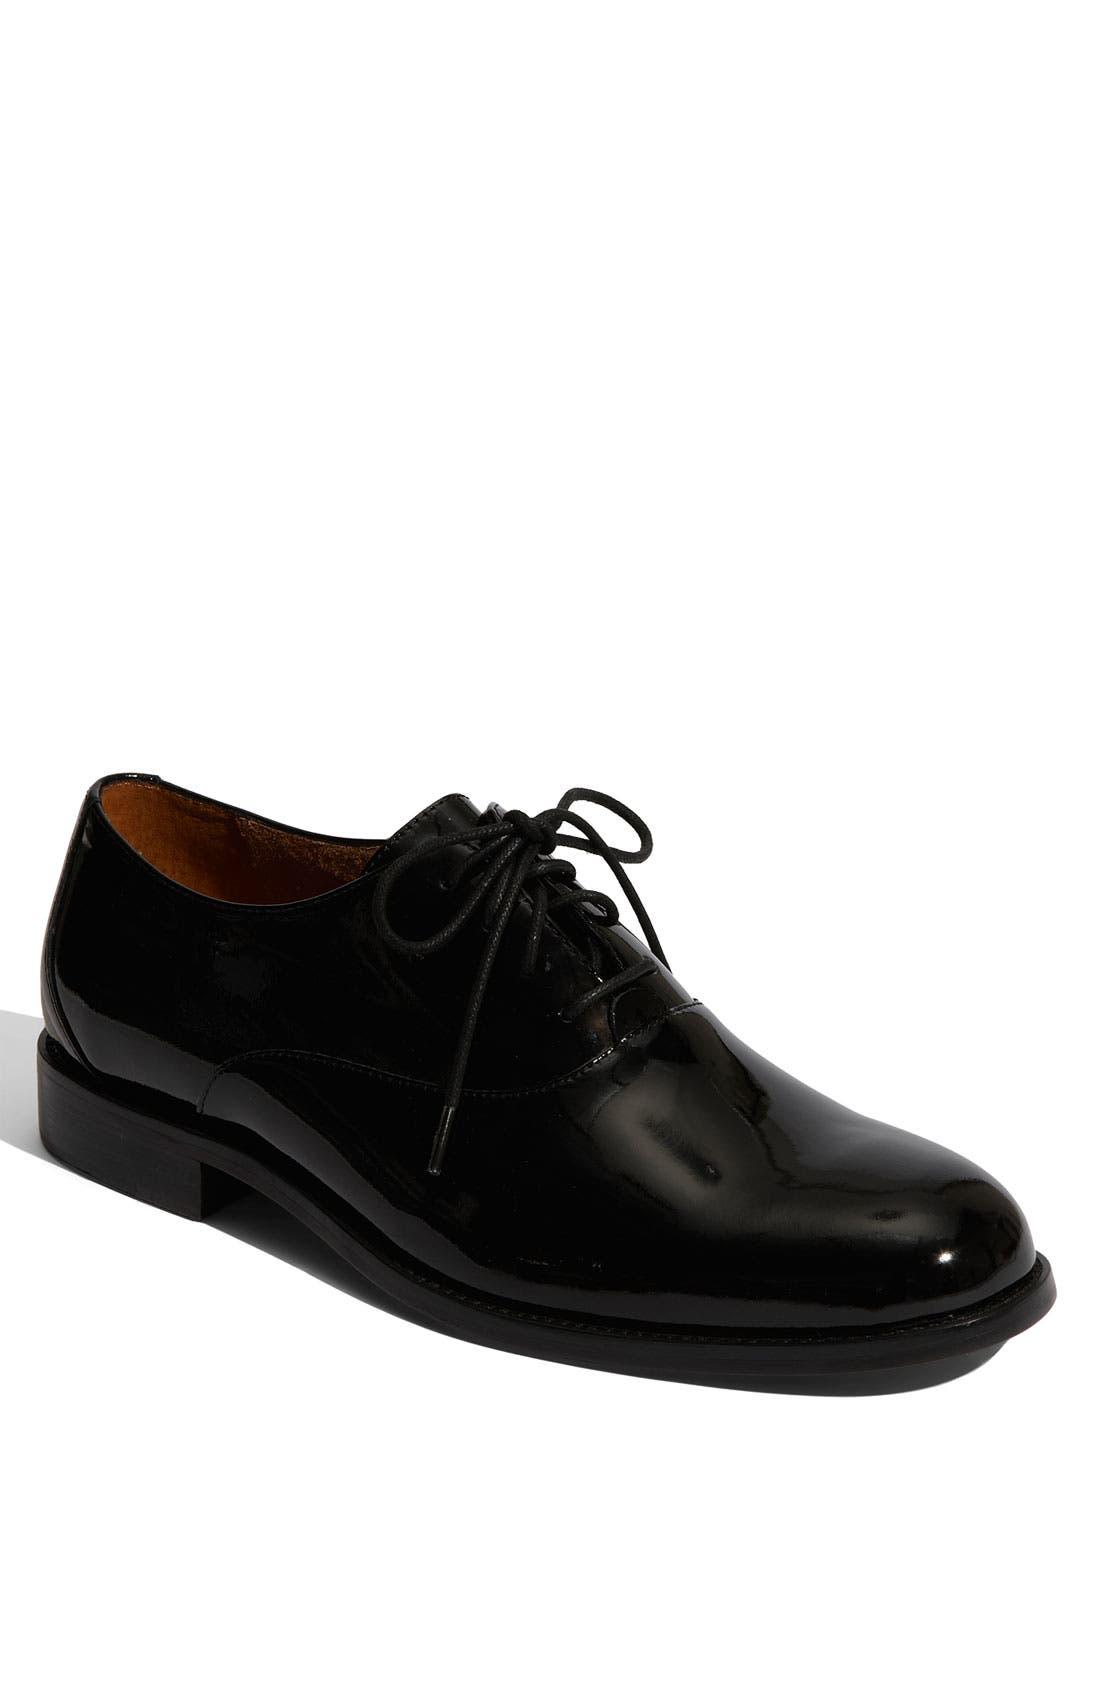 'Kingston' Patent Leather Oxford,                             Main thumbnail 1, color,                             002